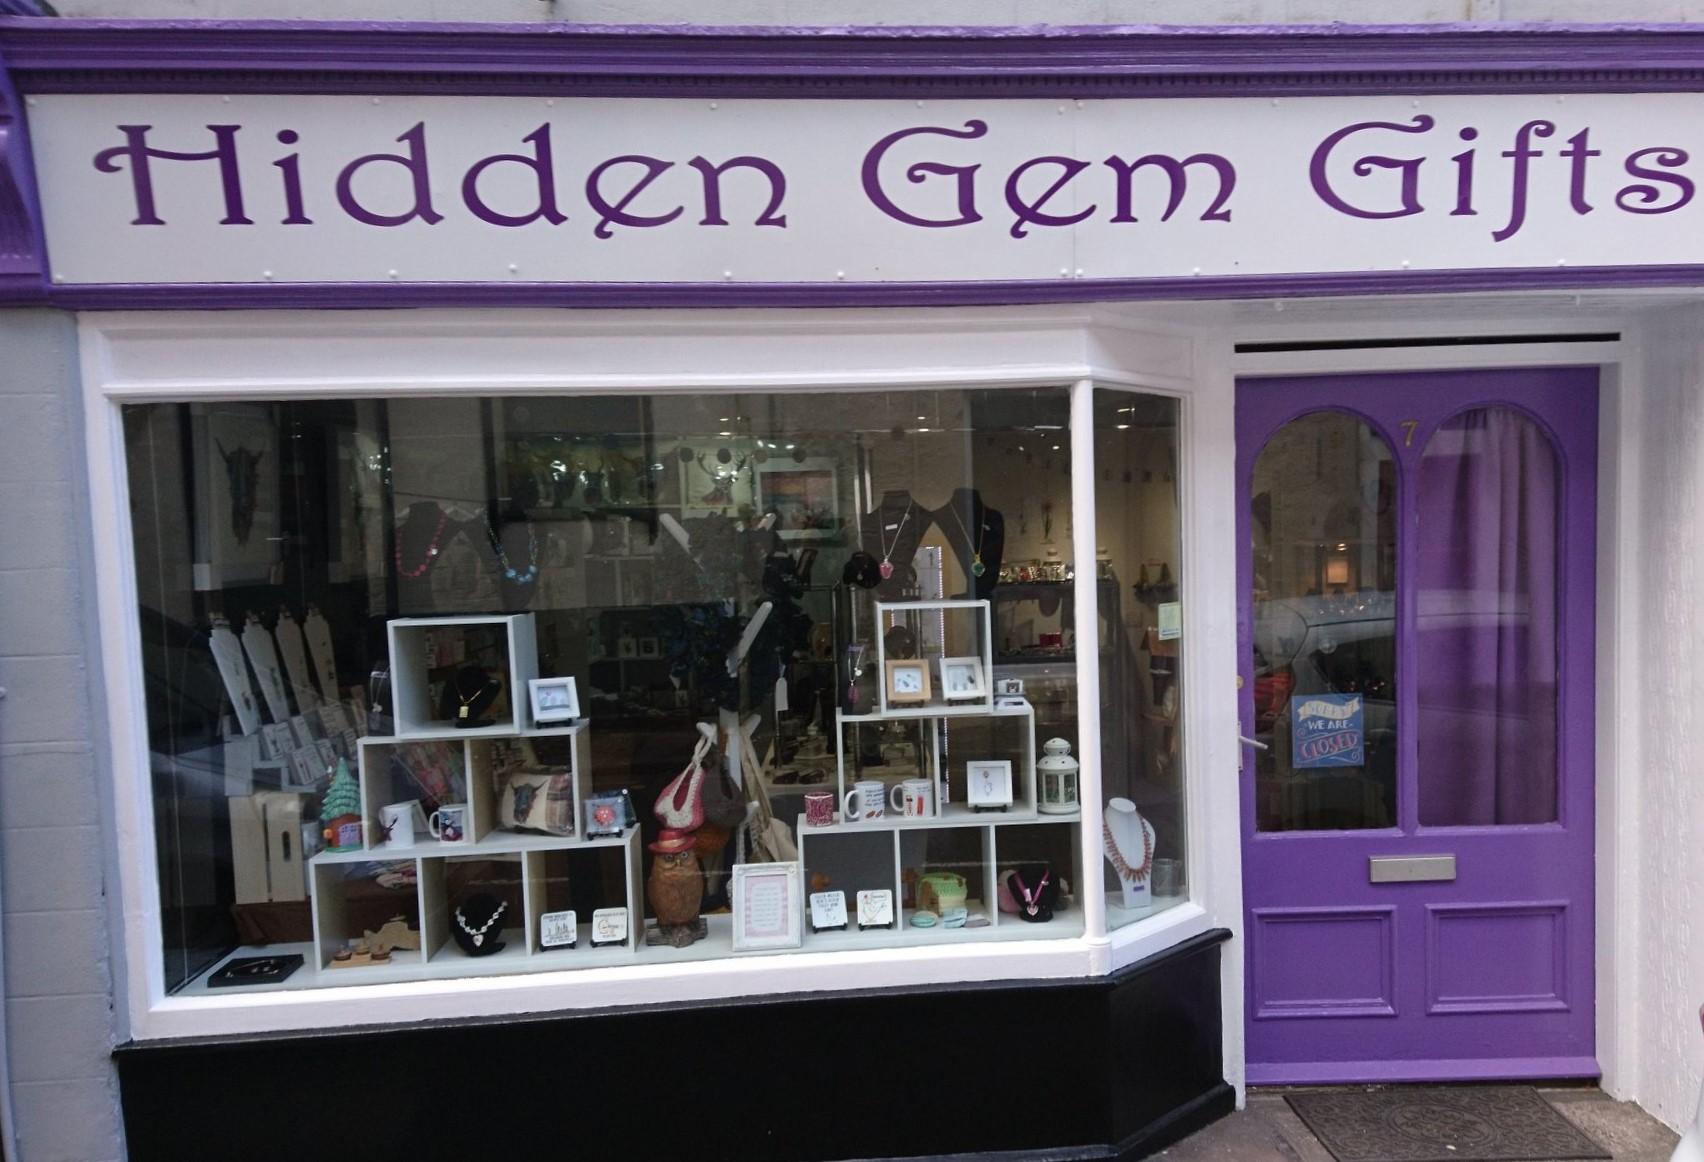 New stockist June 2020. Hidden Gem Gifts Cupar.  Gift shop. Handmade in Scotland.